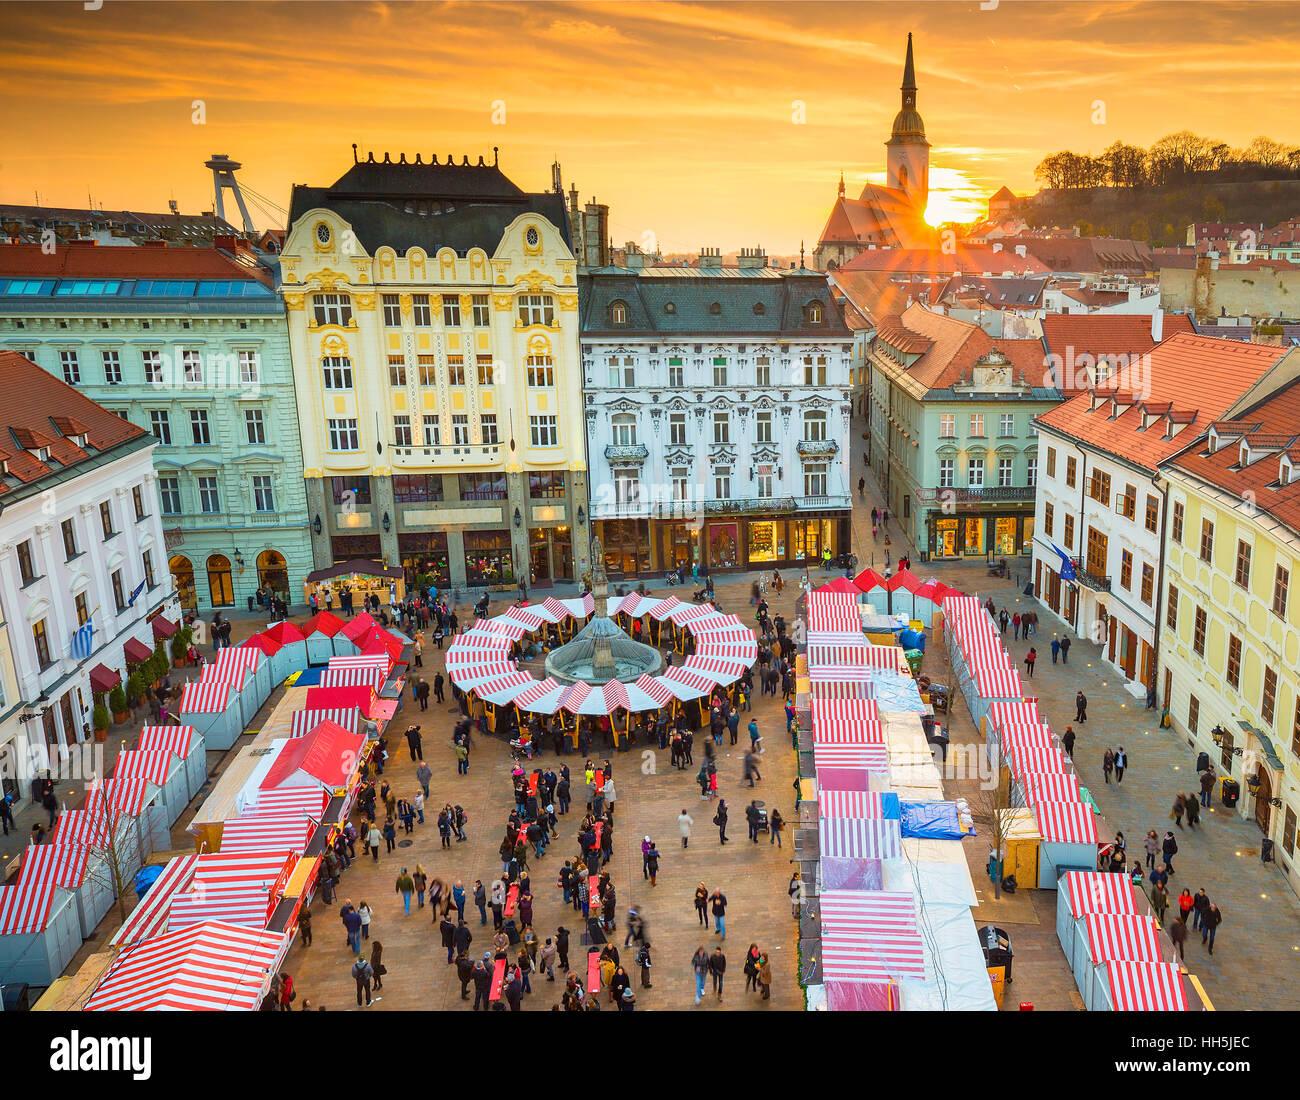 Christmas Bratislava.View On Christmas Market On The Main Square In Bratislava